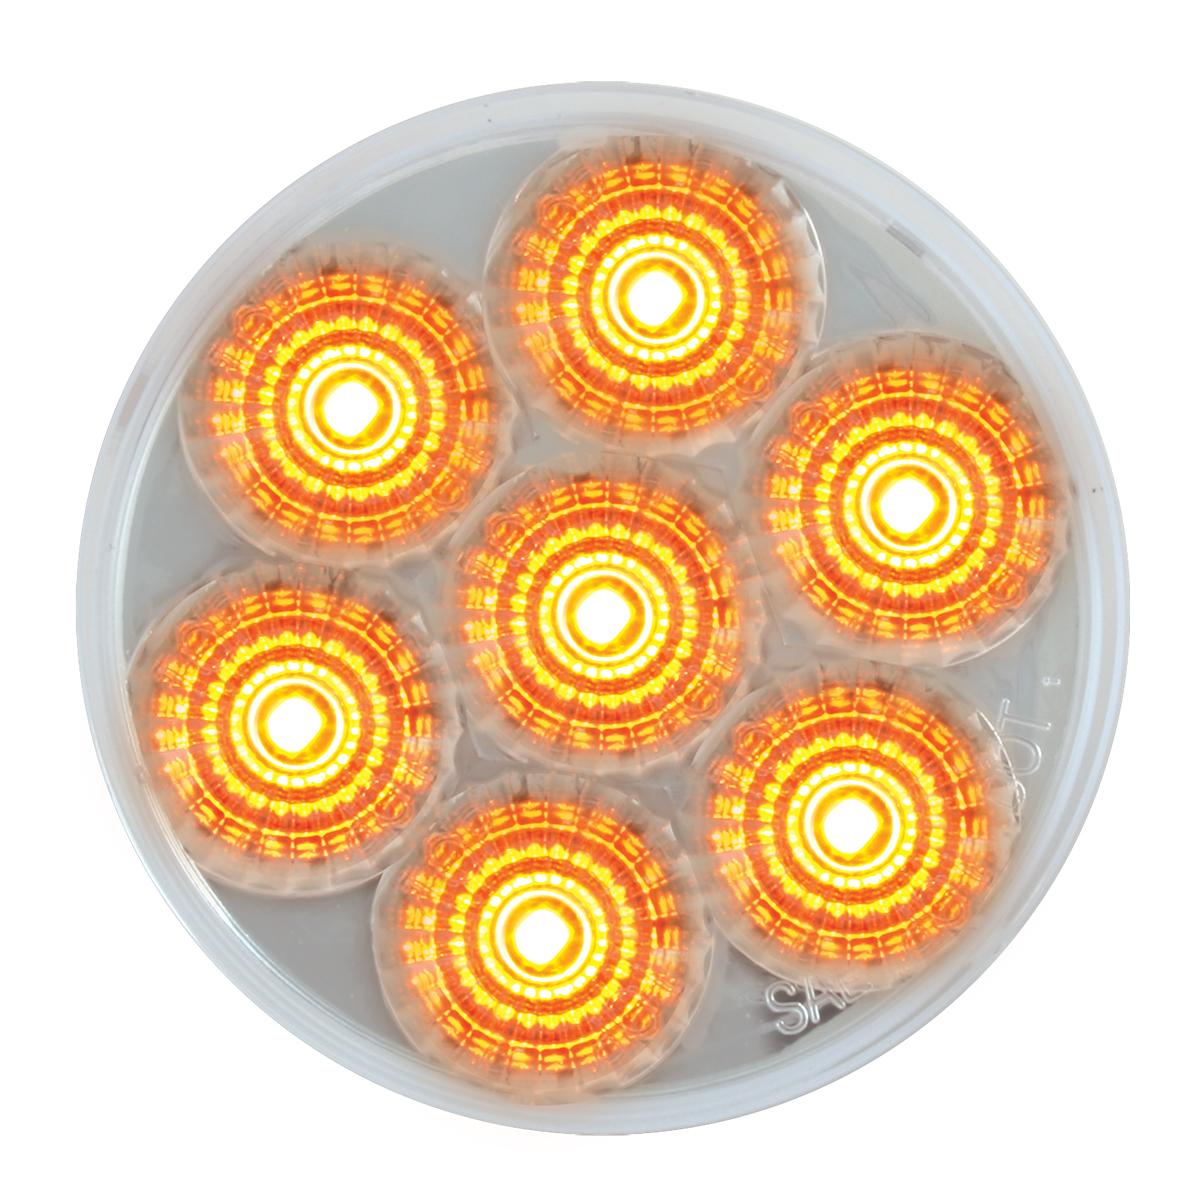 "76666 2-1/2"" Dual Function Spyder LED Light"